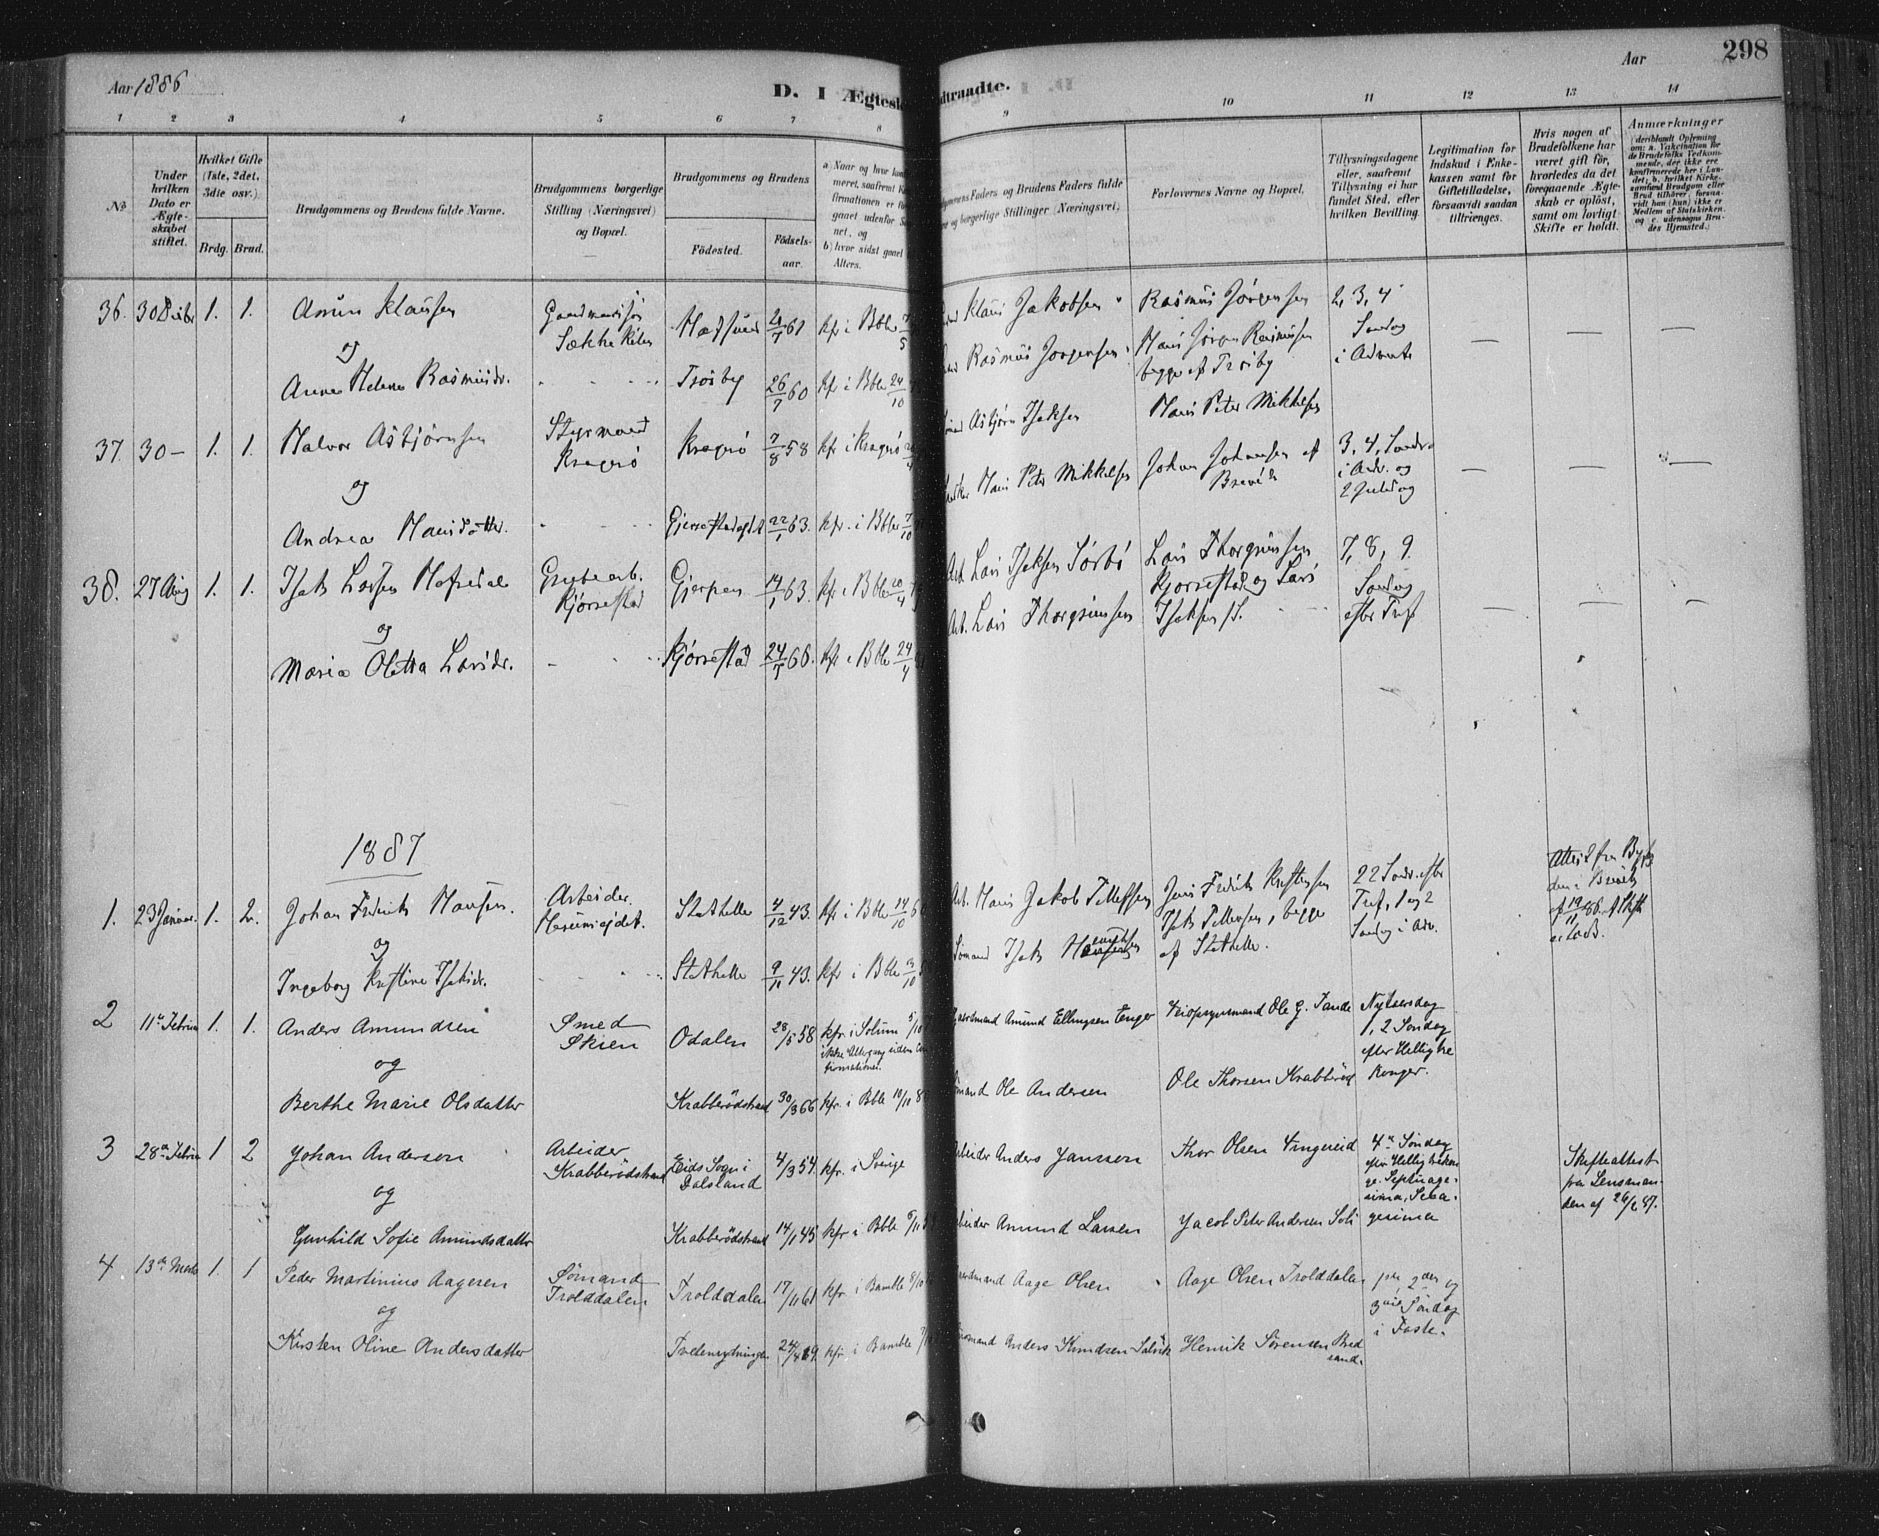 SAKO, Bamble kirkebøker, F/Fa/L0007: Ministerialbok nr. I 7, 1878-1888, s. 298